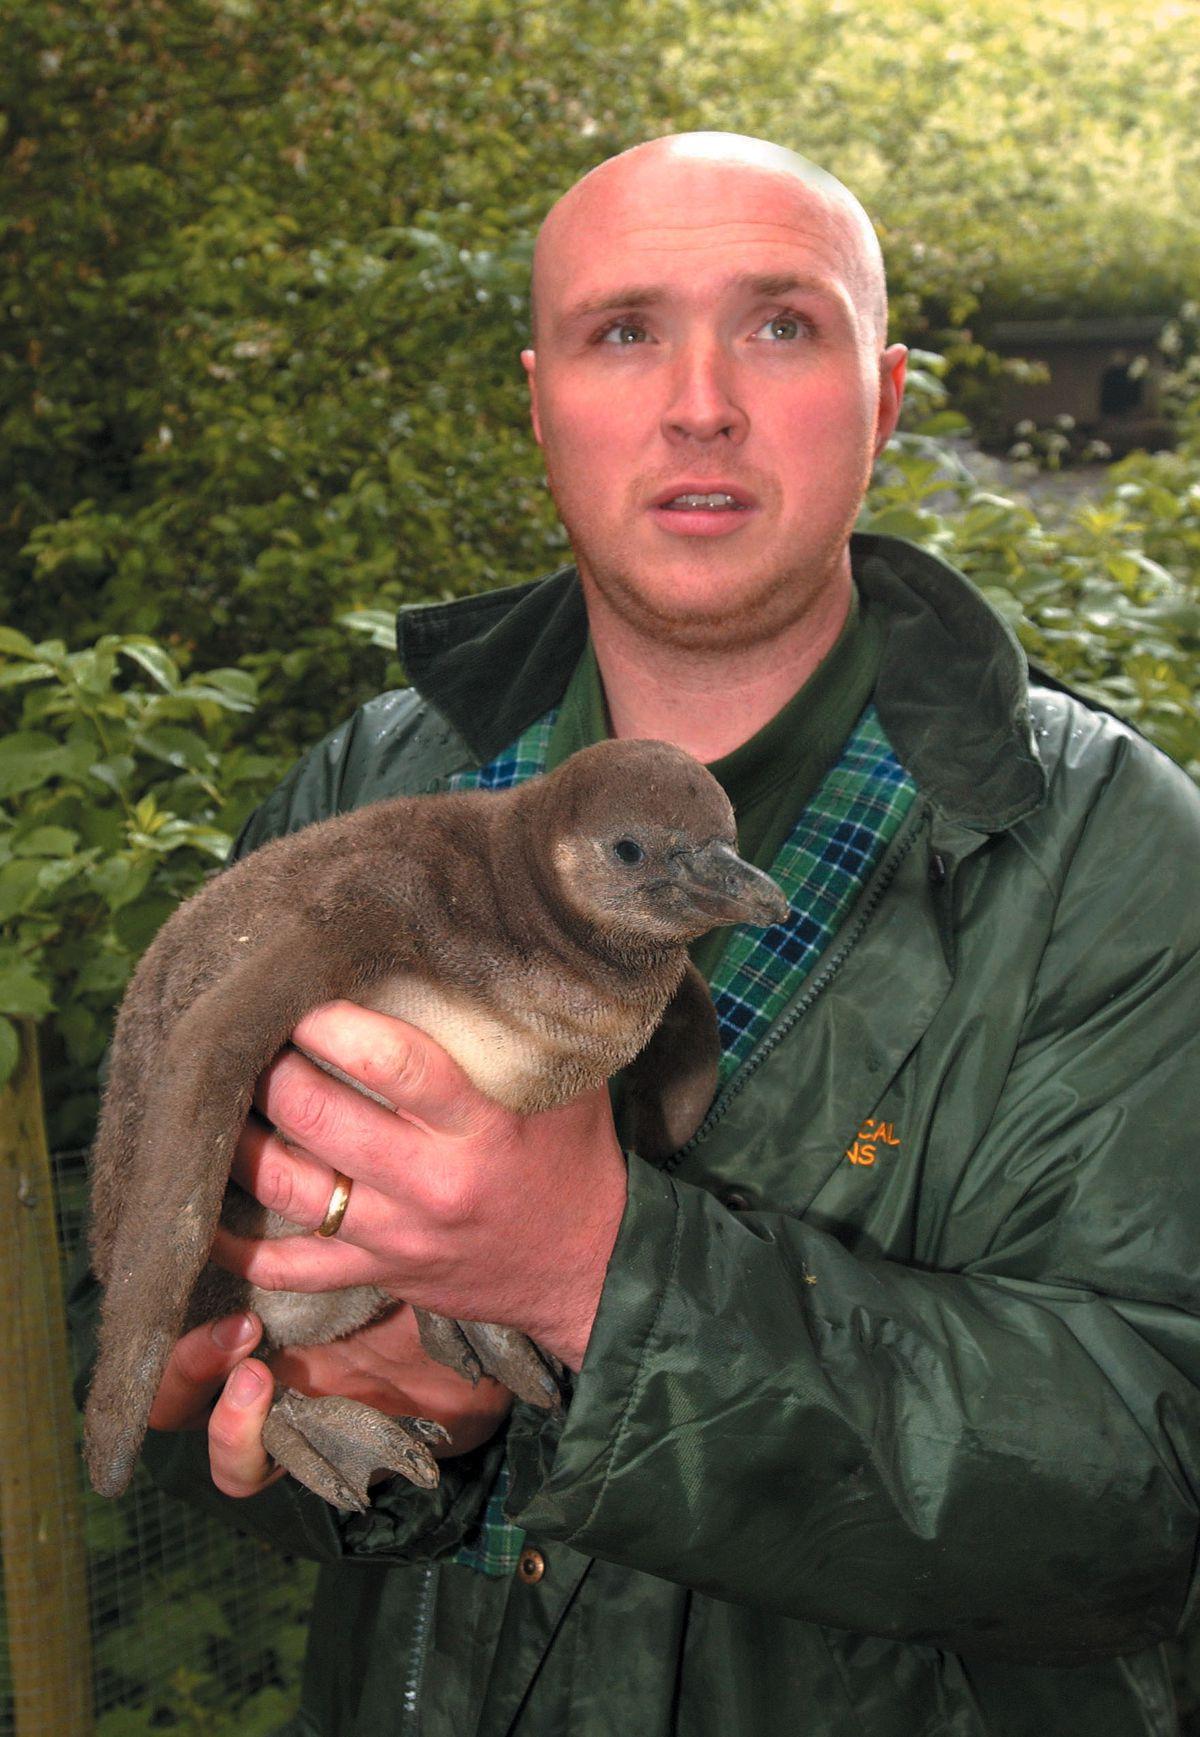 Dudley Zoo manager Matt Lewis